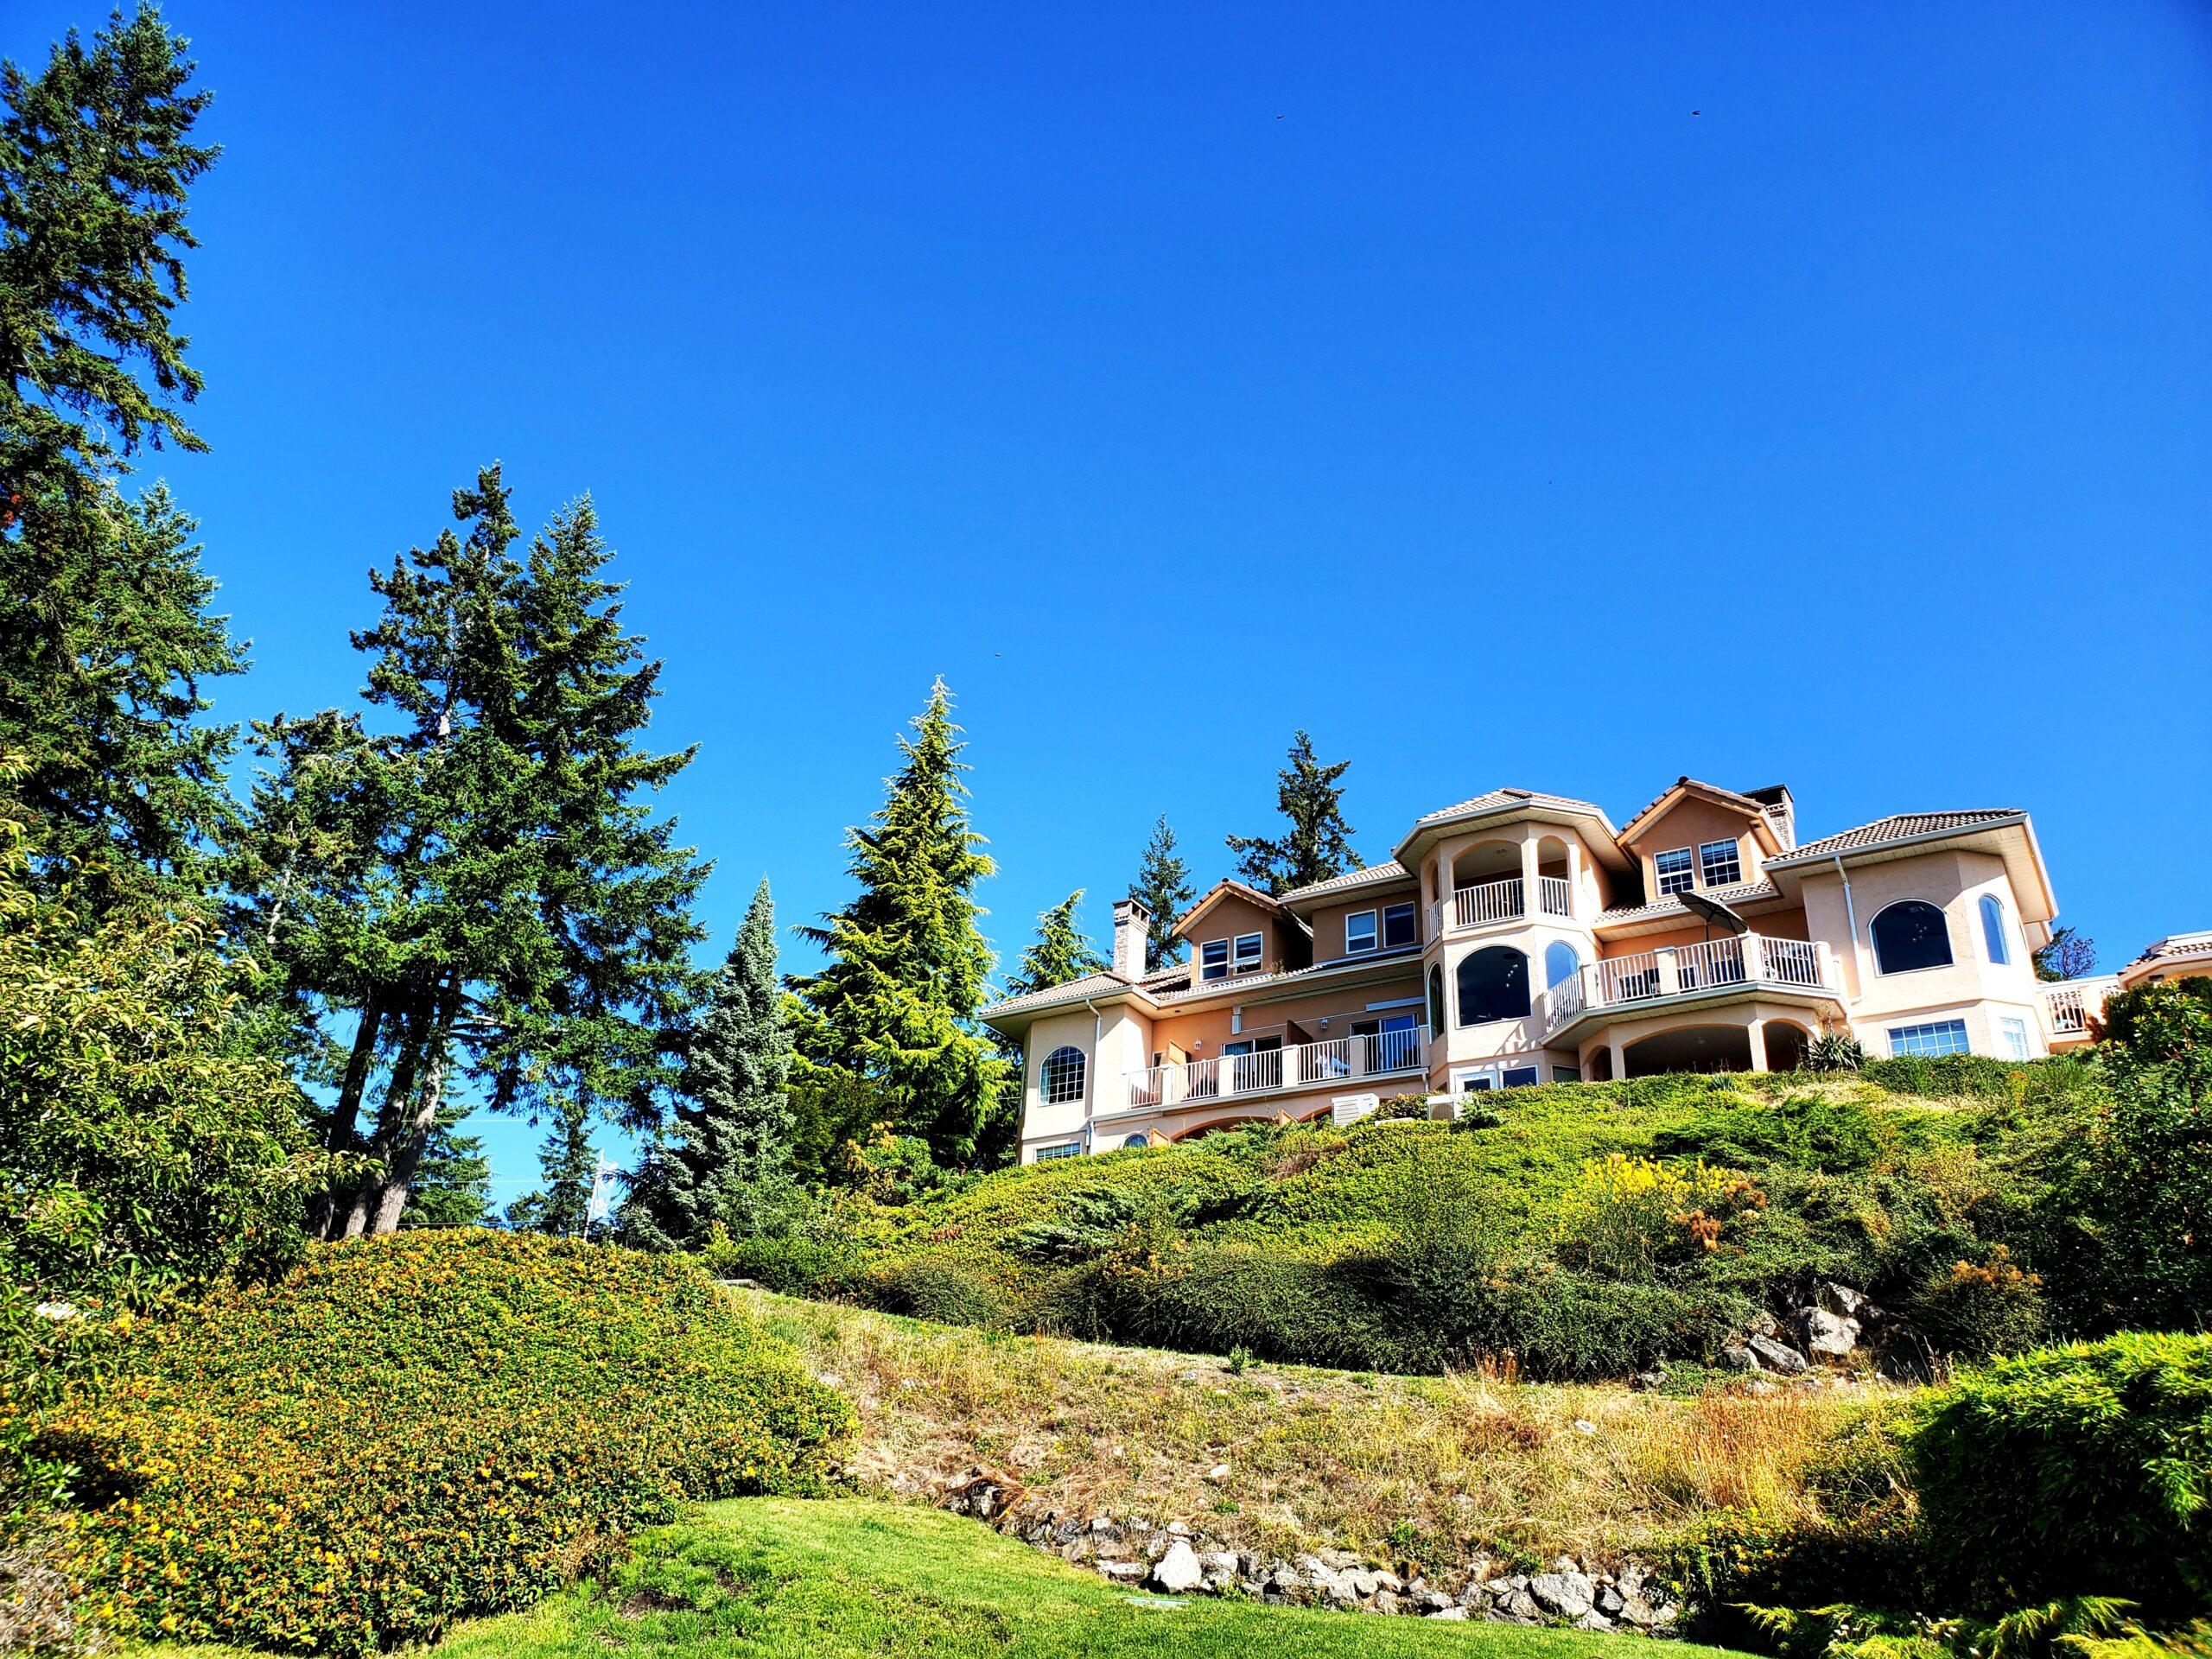 villa eyrie, vancouver island, alpina restaurant, helen siwak, coleman pete, ecoluxluv, folioyvr, vancouver, bc, vancity, luxury resort, travel, yvr